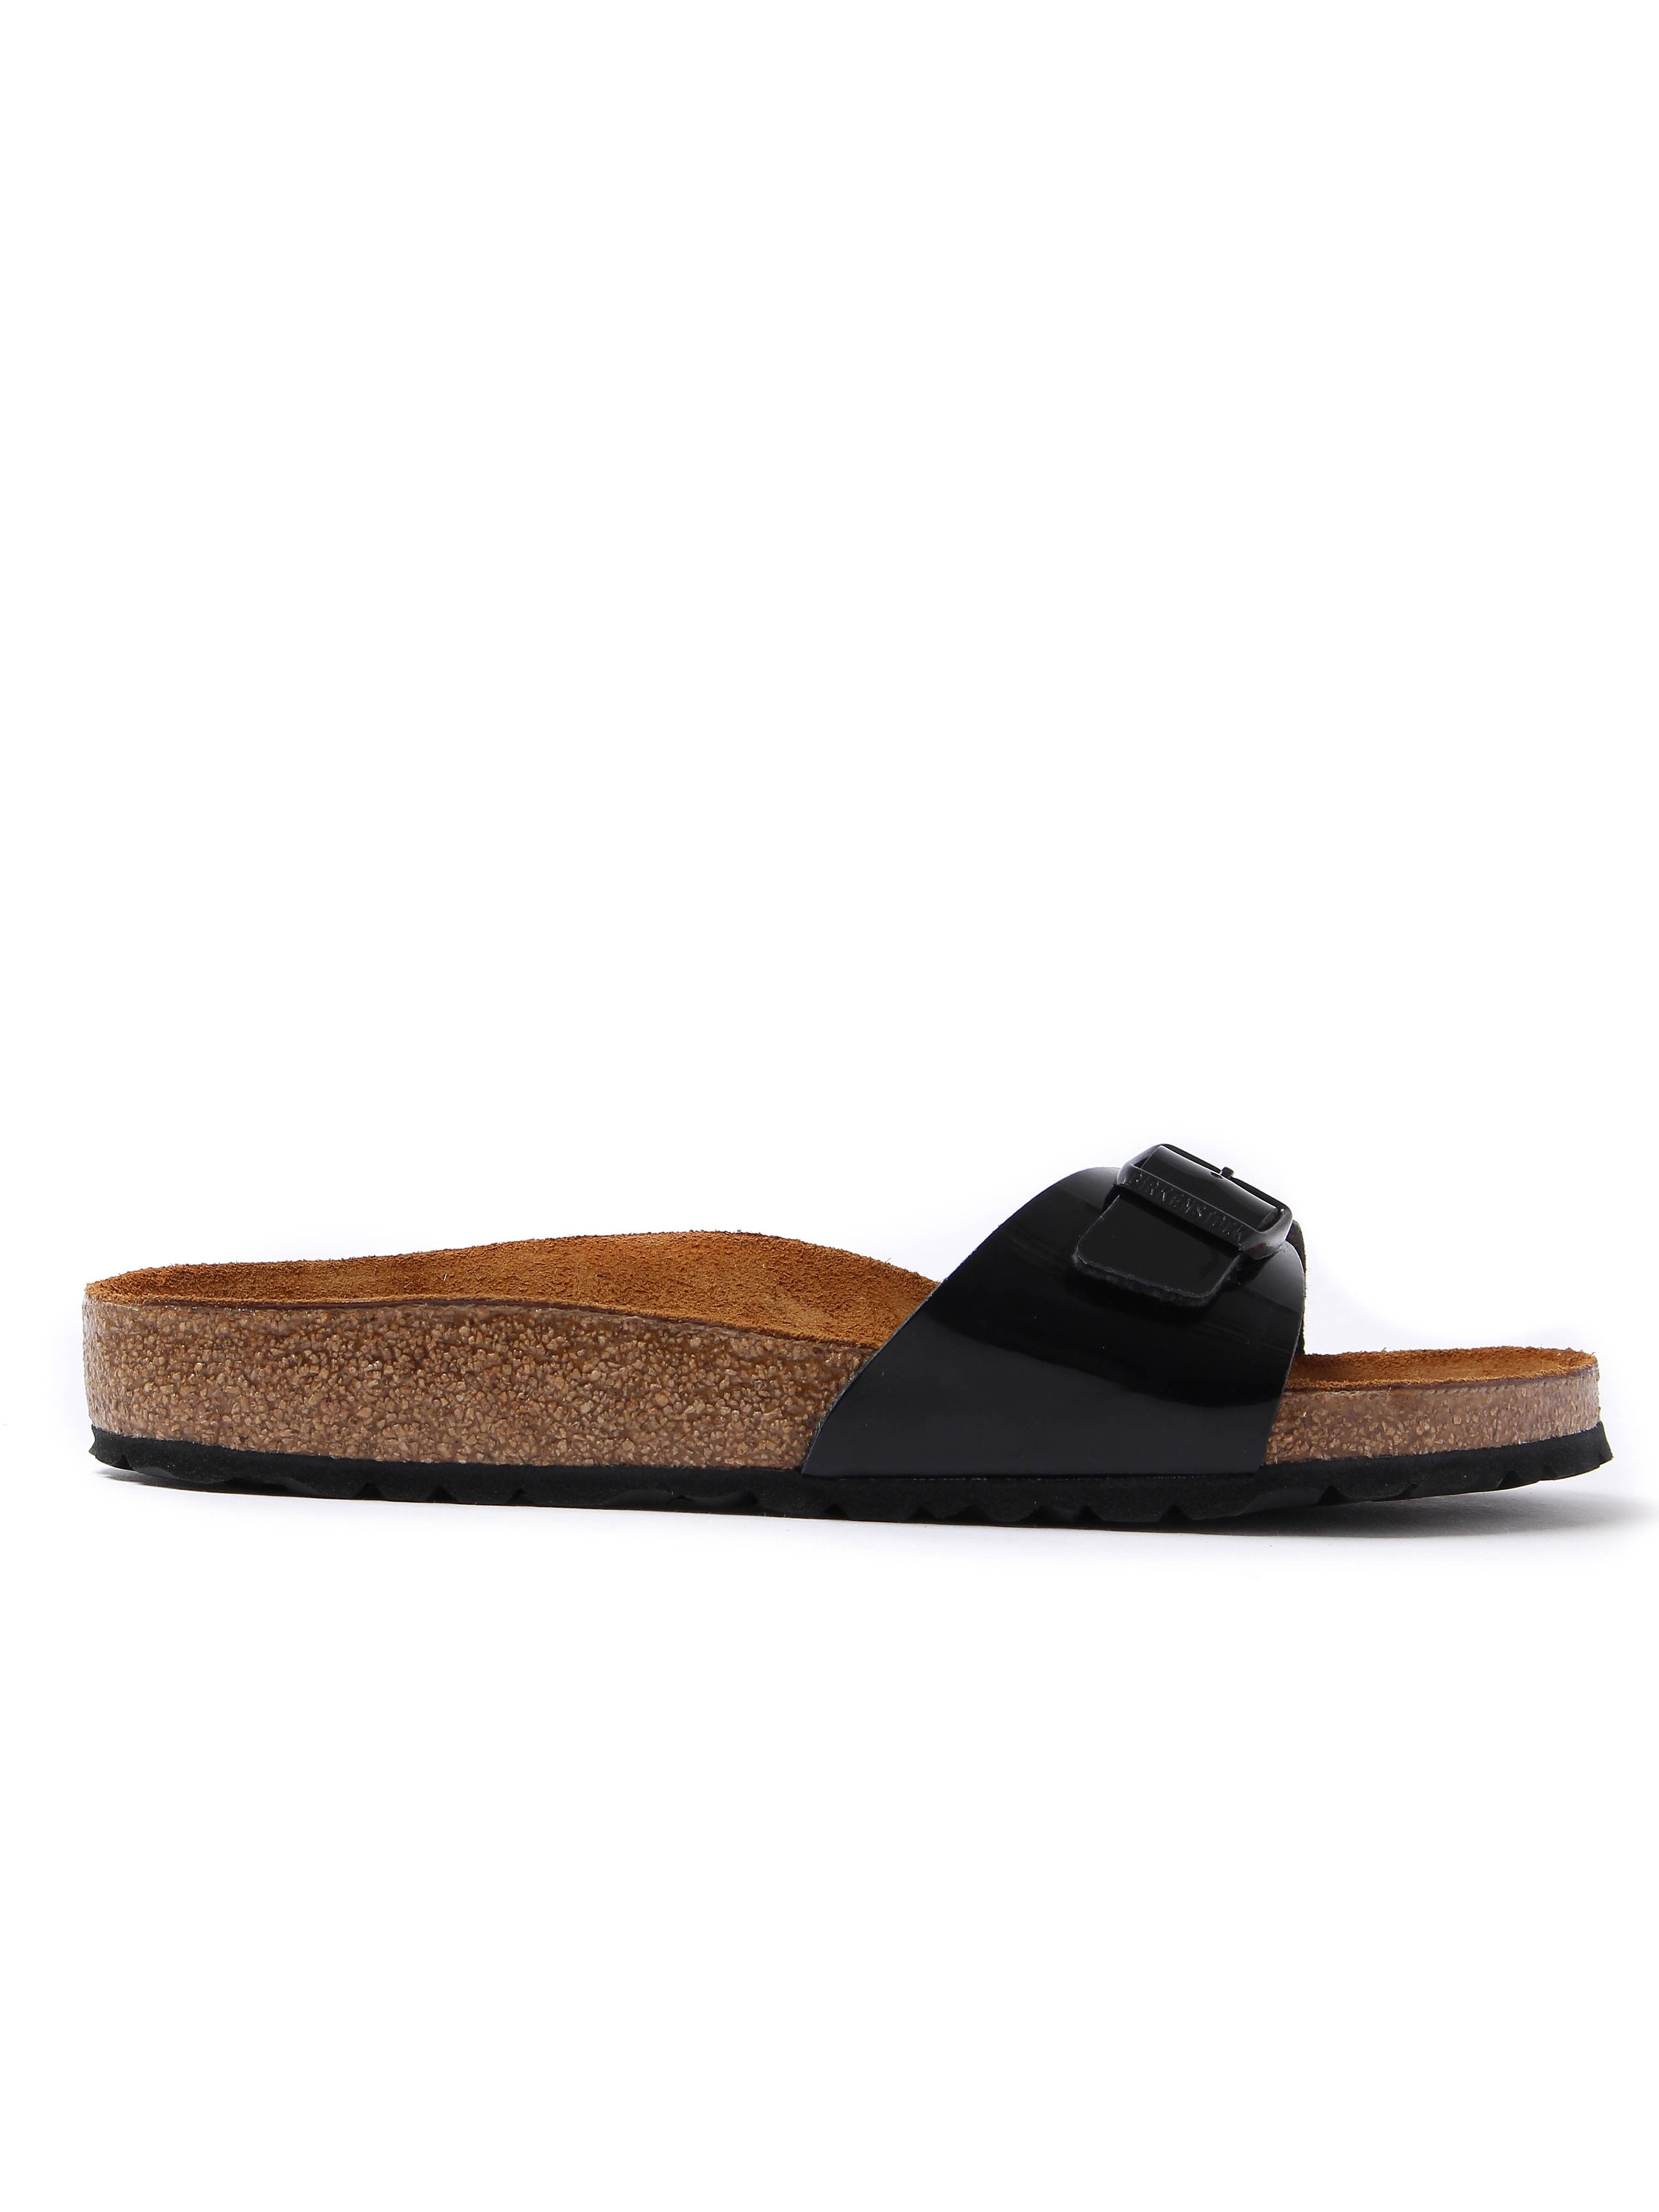 Birkenstock Women's Madrid Single Strap Sandals - Black Patent